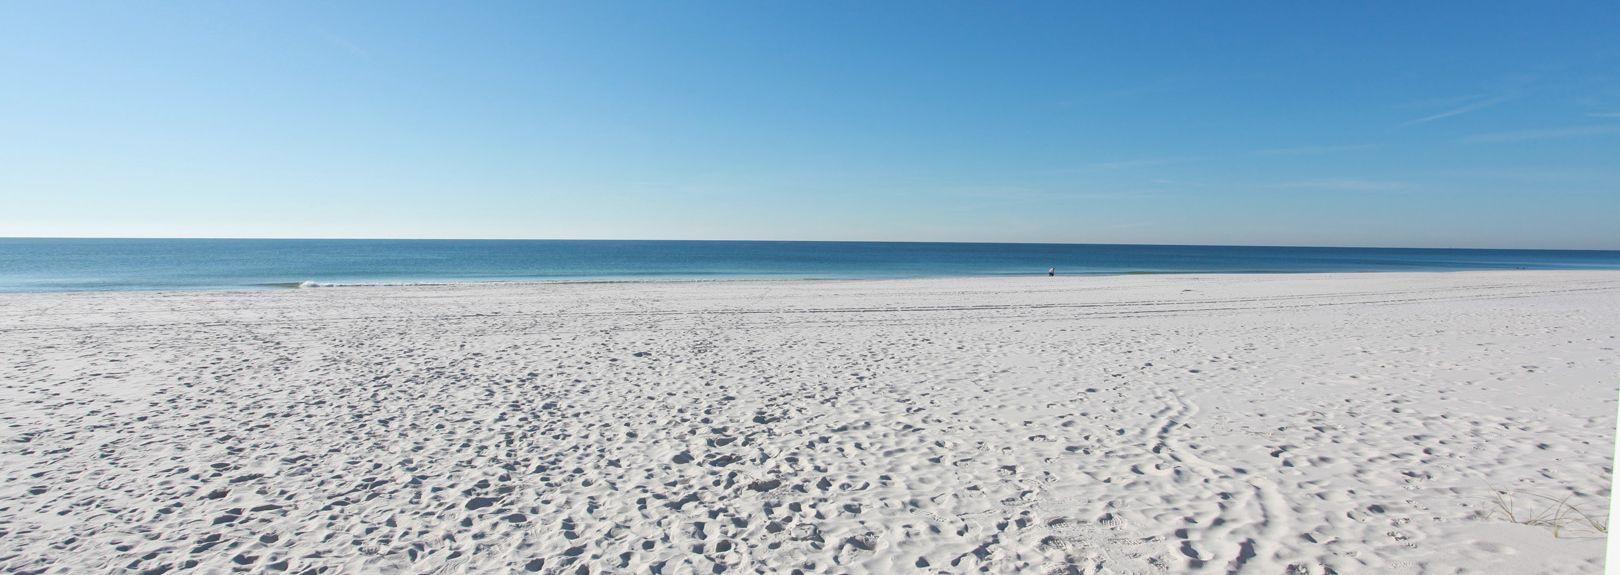 Island Winds West, Gulf Shores, Alabama, United States of America